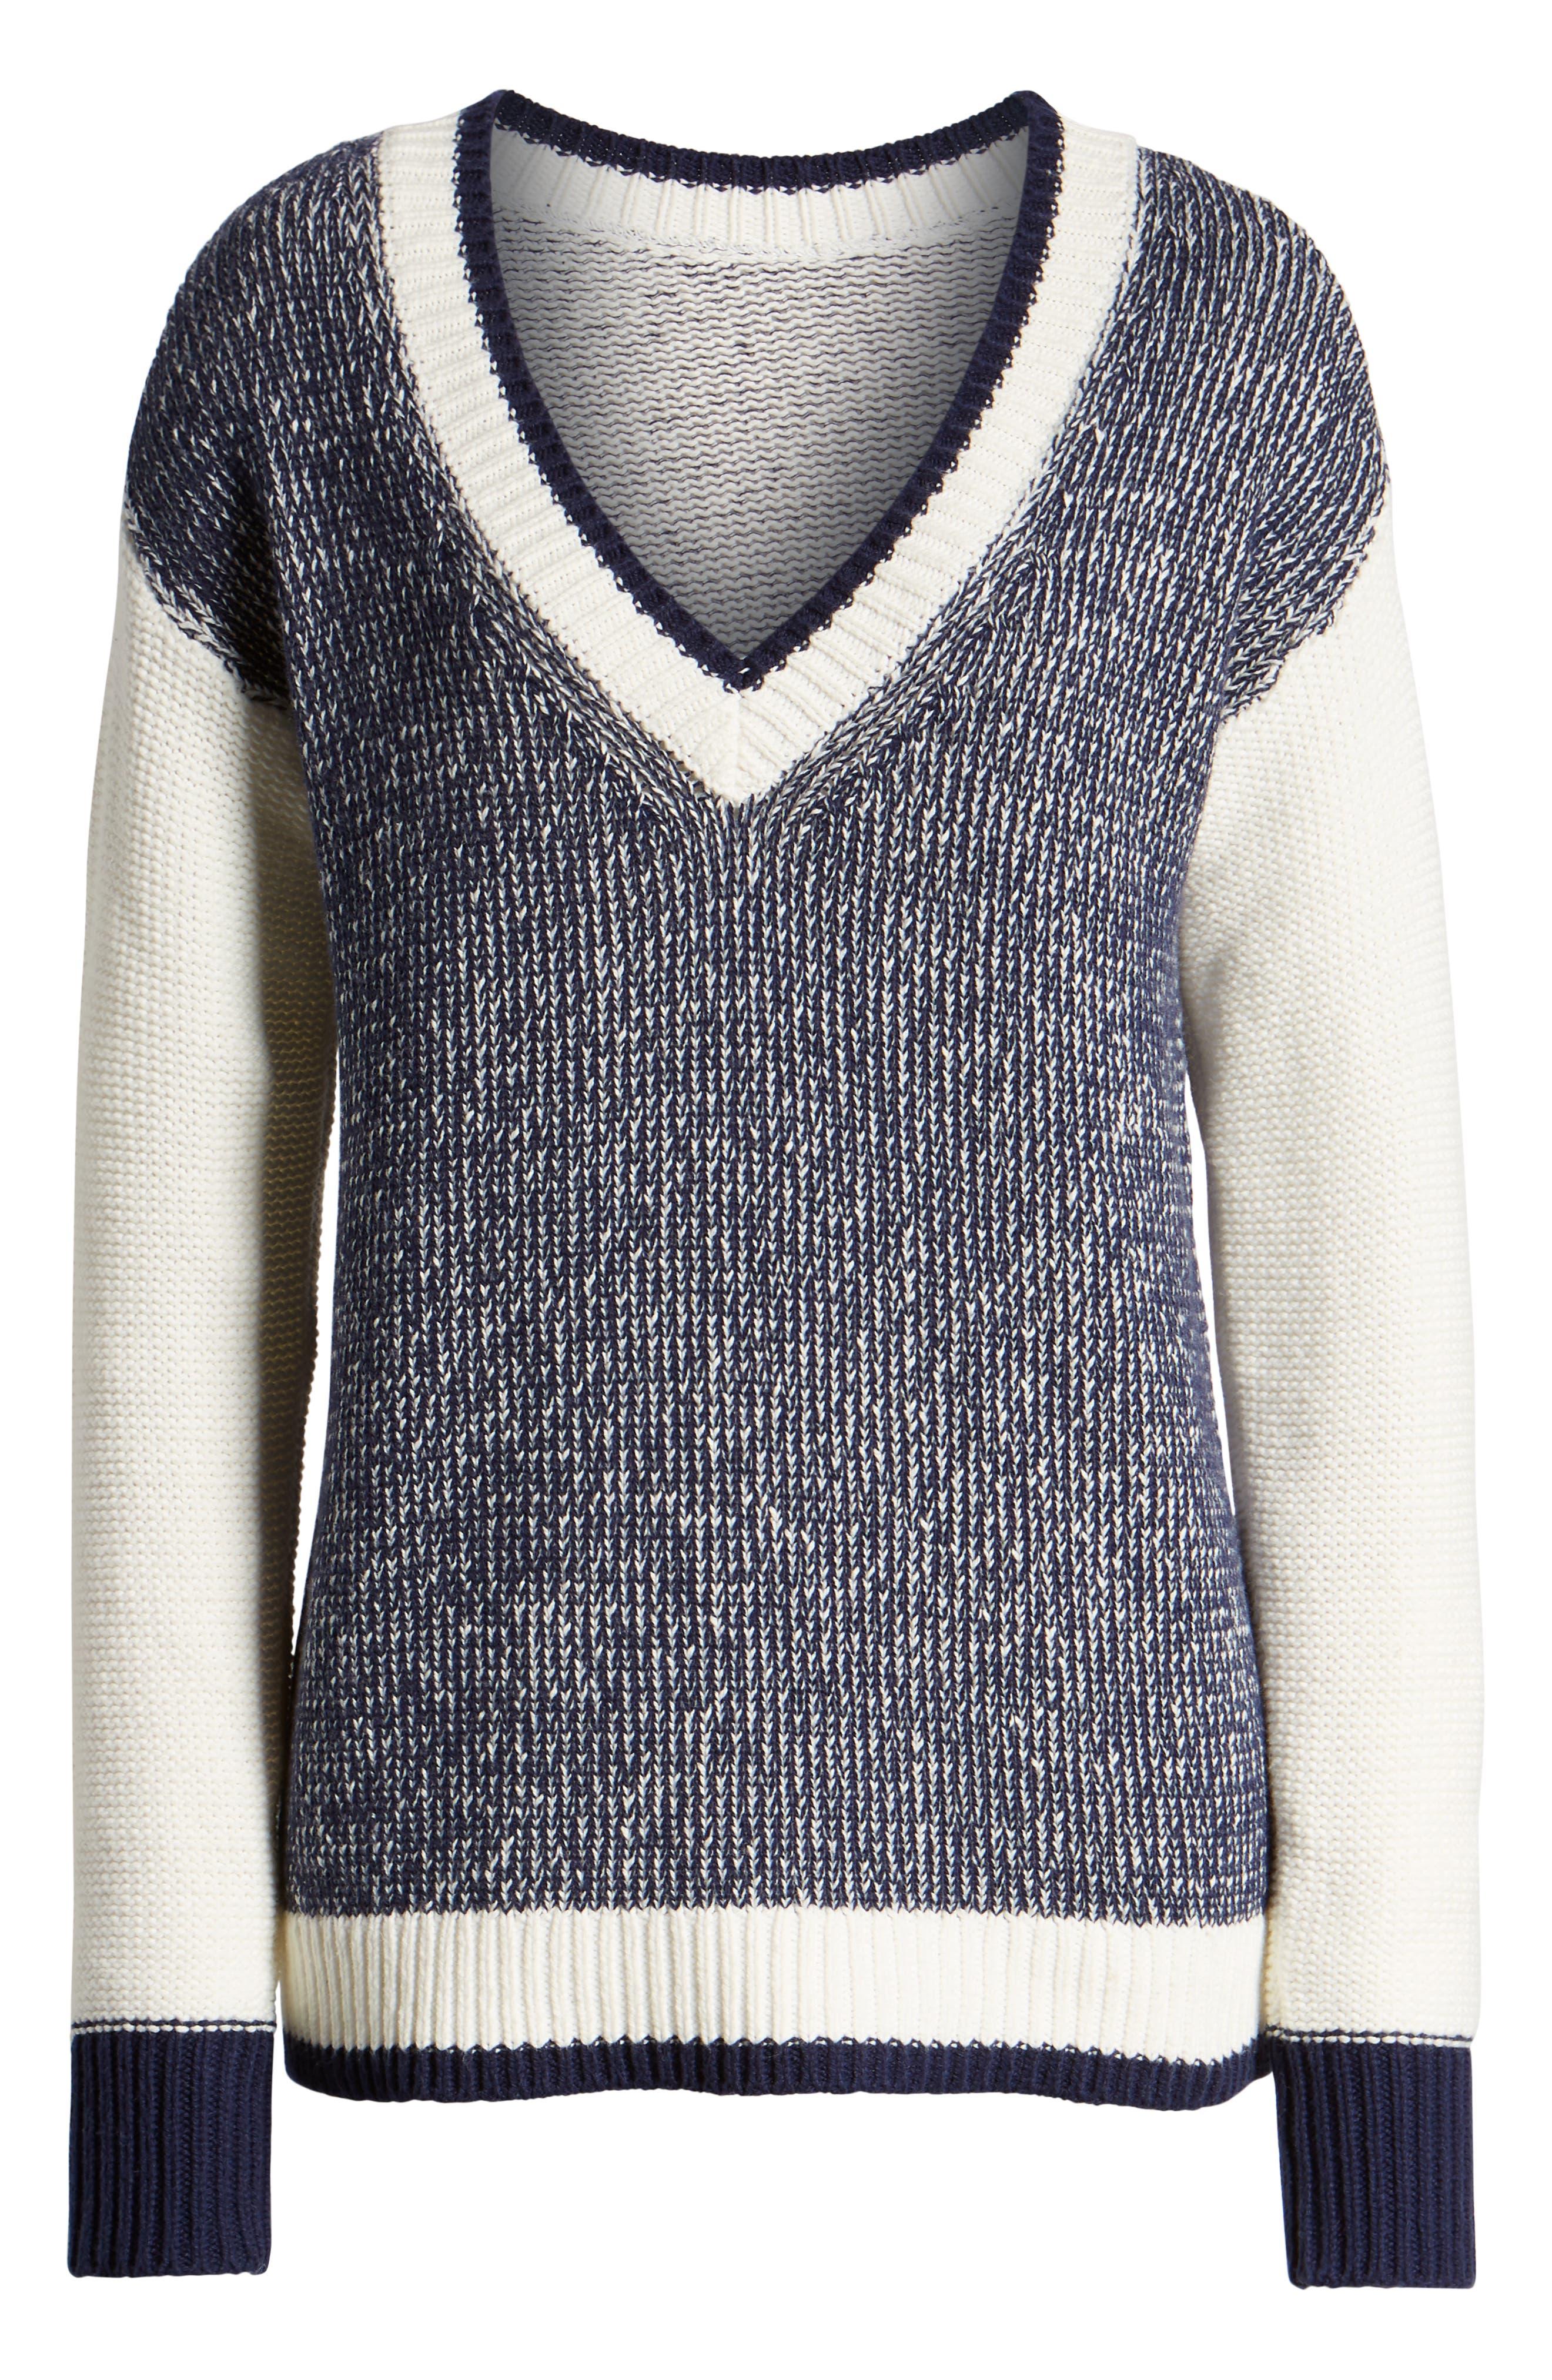 Marled V-Neck Sweater,                             Alternate thumbnail 6, color,                             NAVY MARITIME- WHITE COMBO